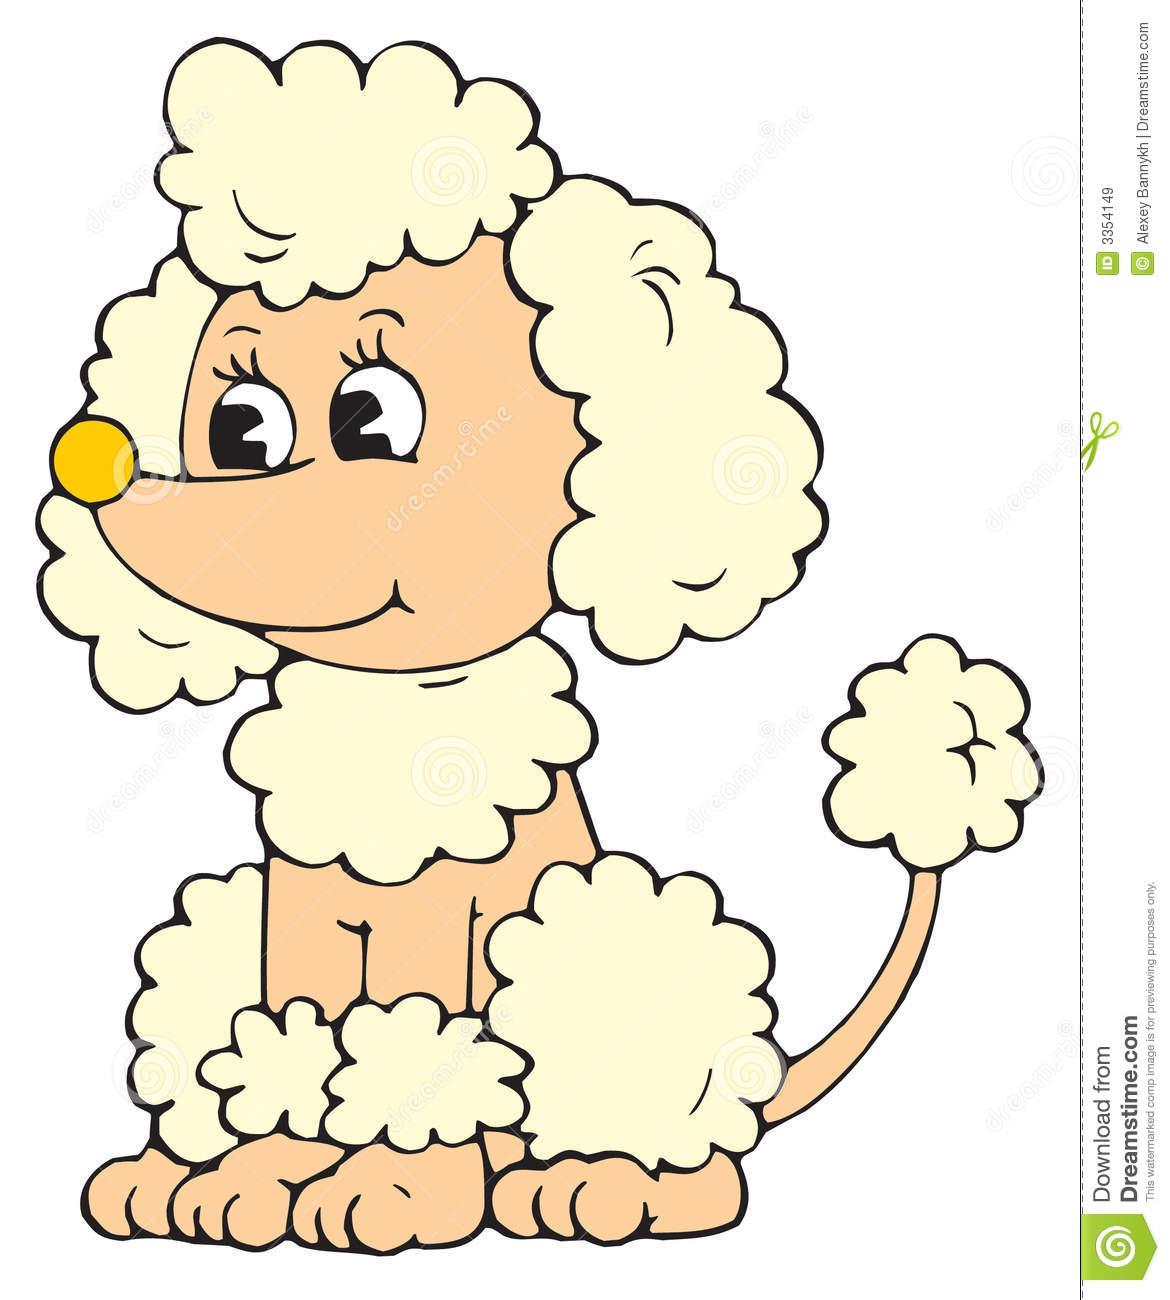 Poodle clipart vector.